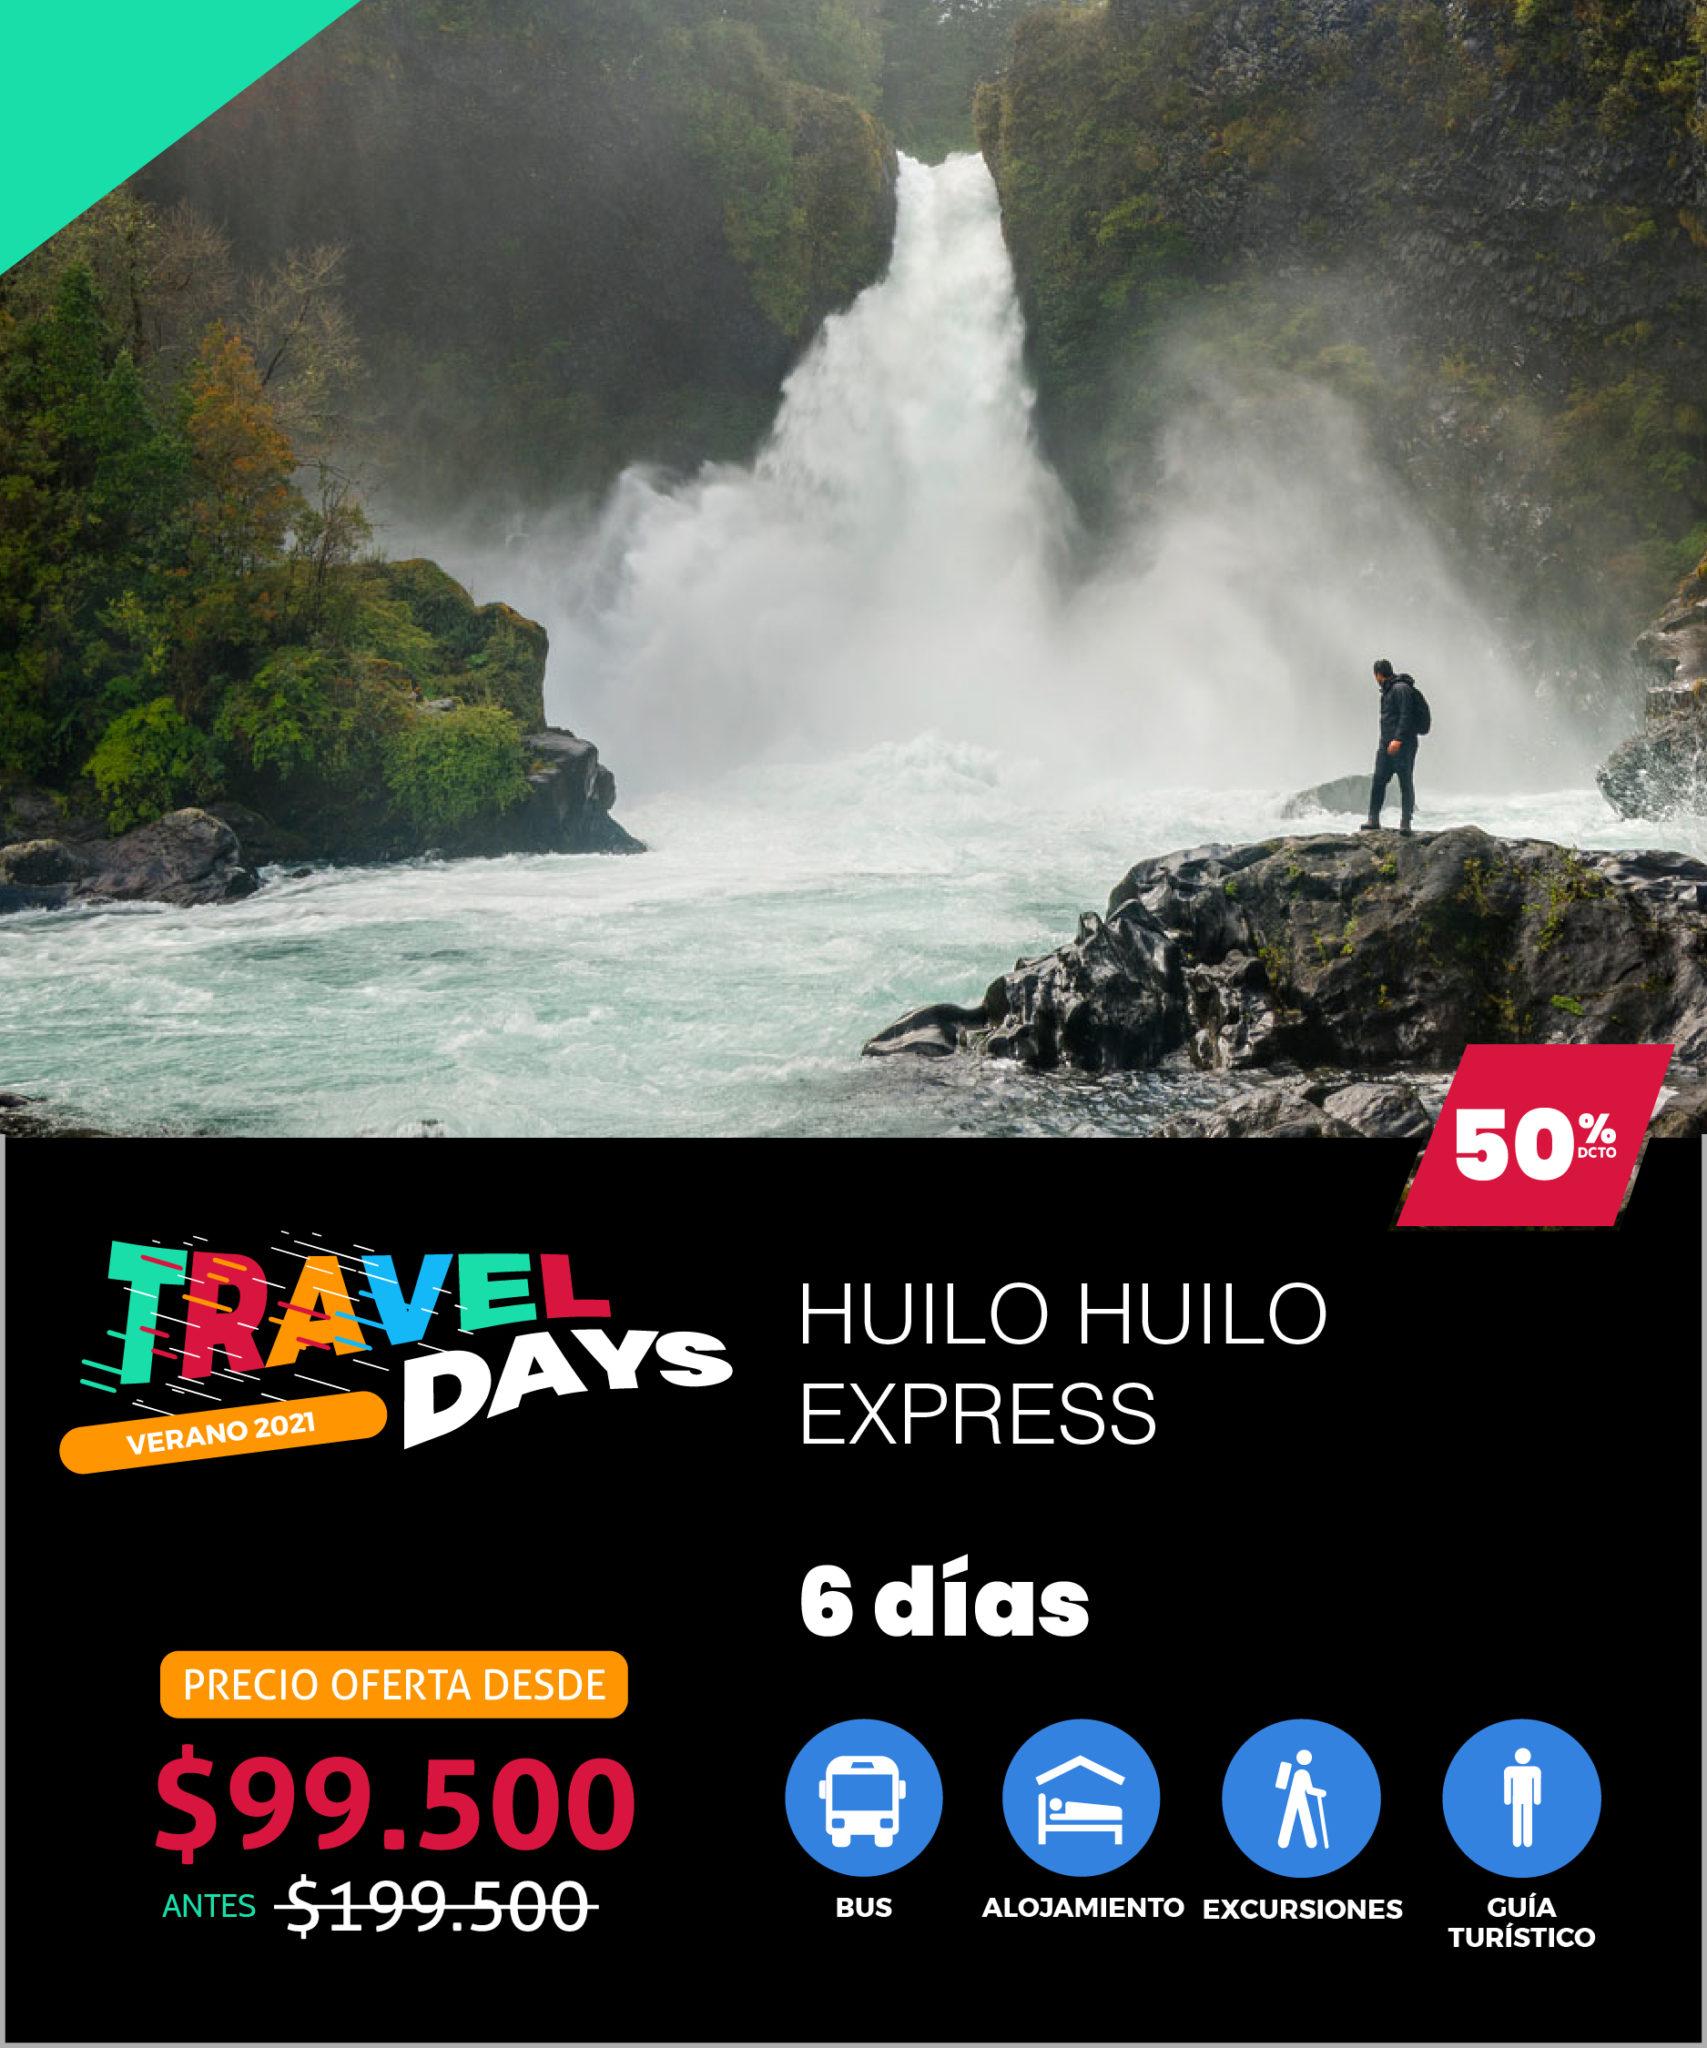 HUILO HUILO EXPRESS